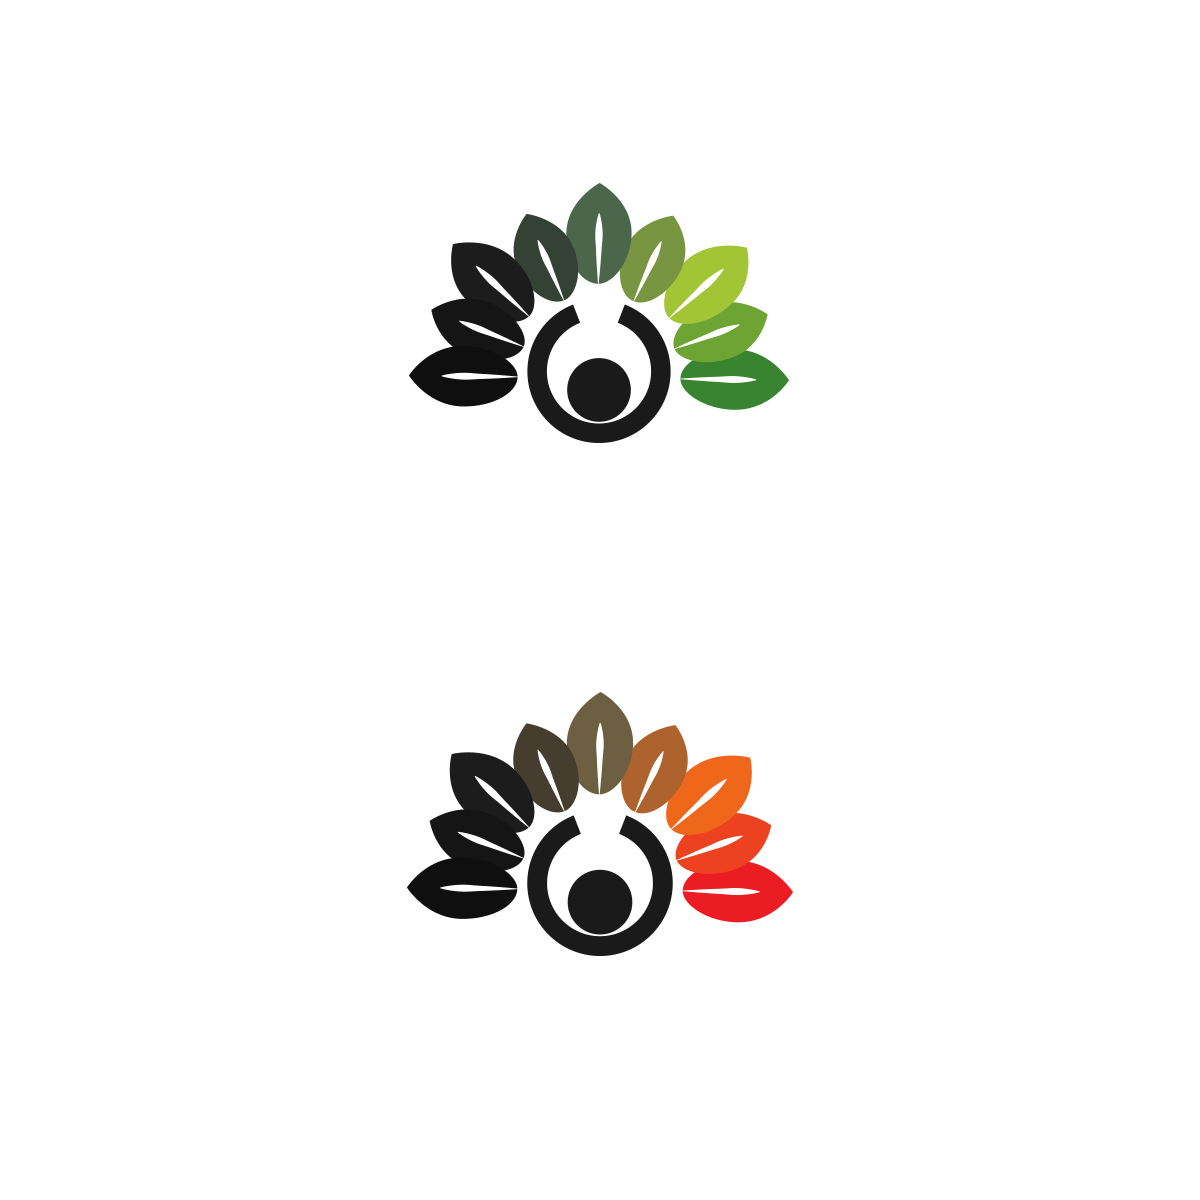 Разработать логотип для Онлайн-школы и сообщества фото f_1245bc5e1b6dce98.jpg